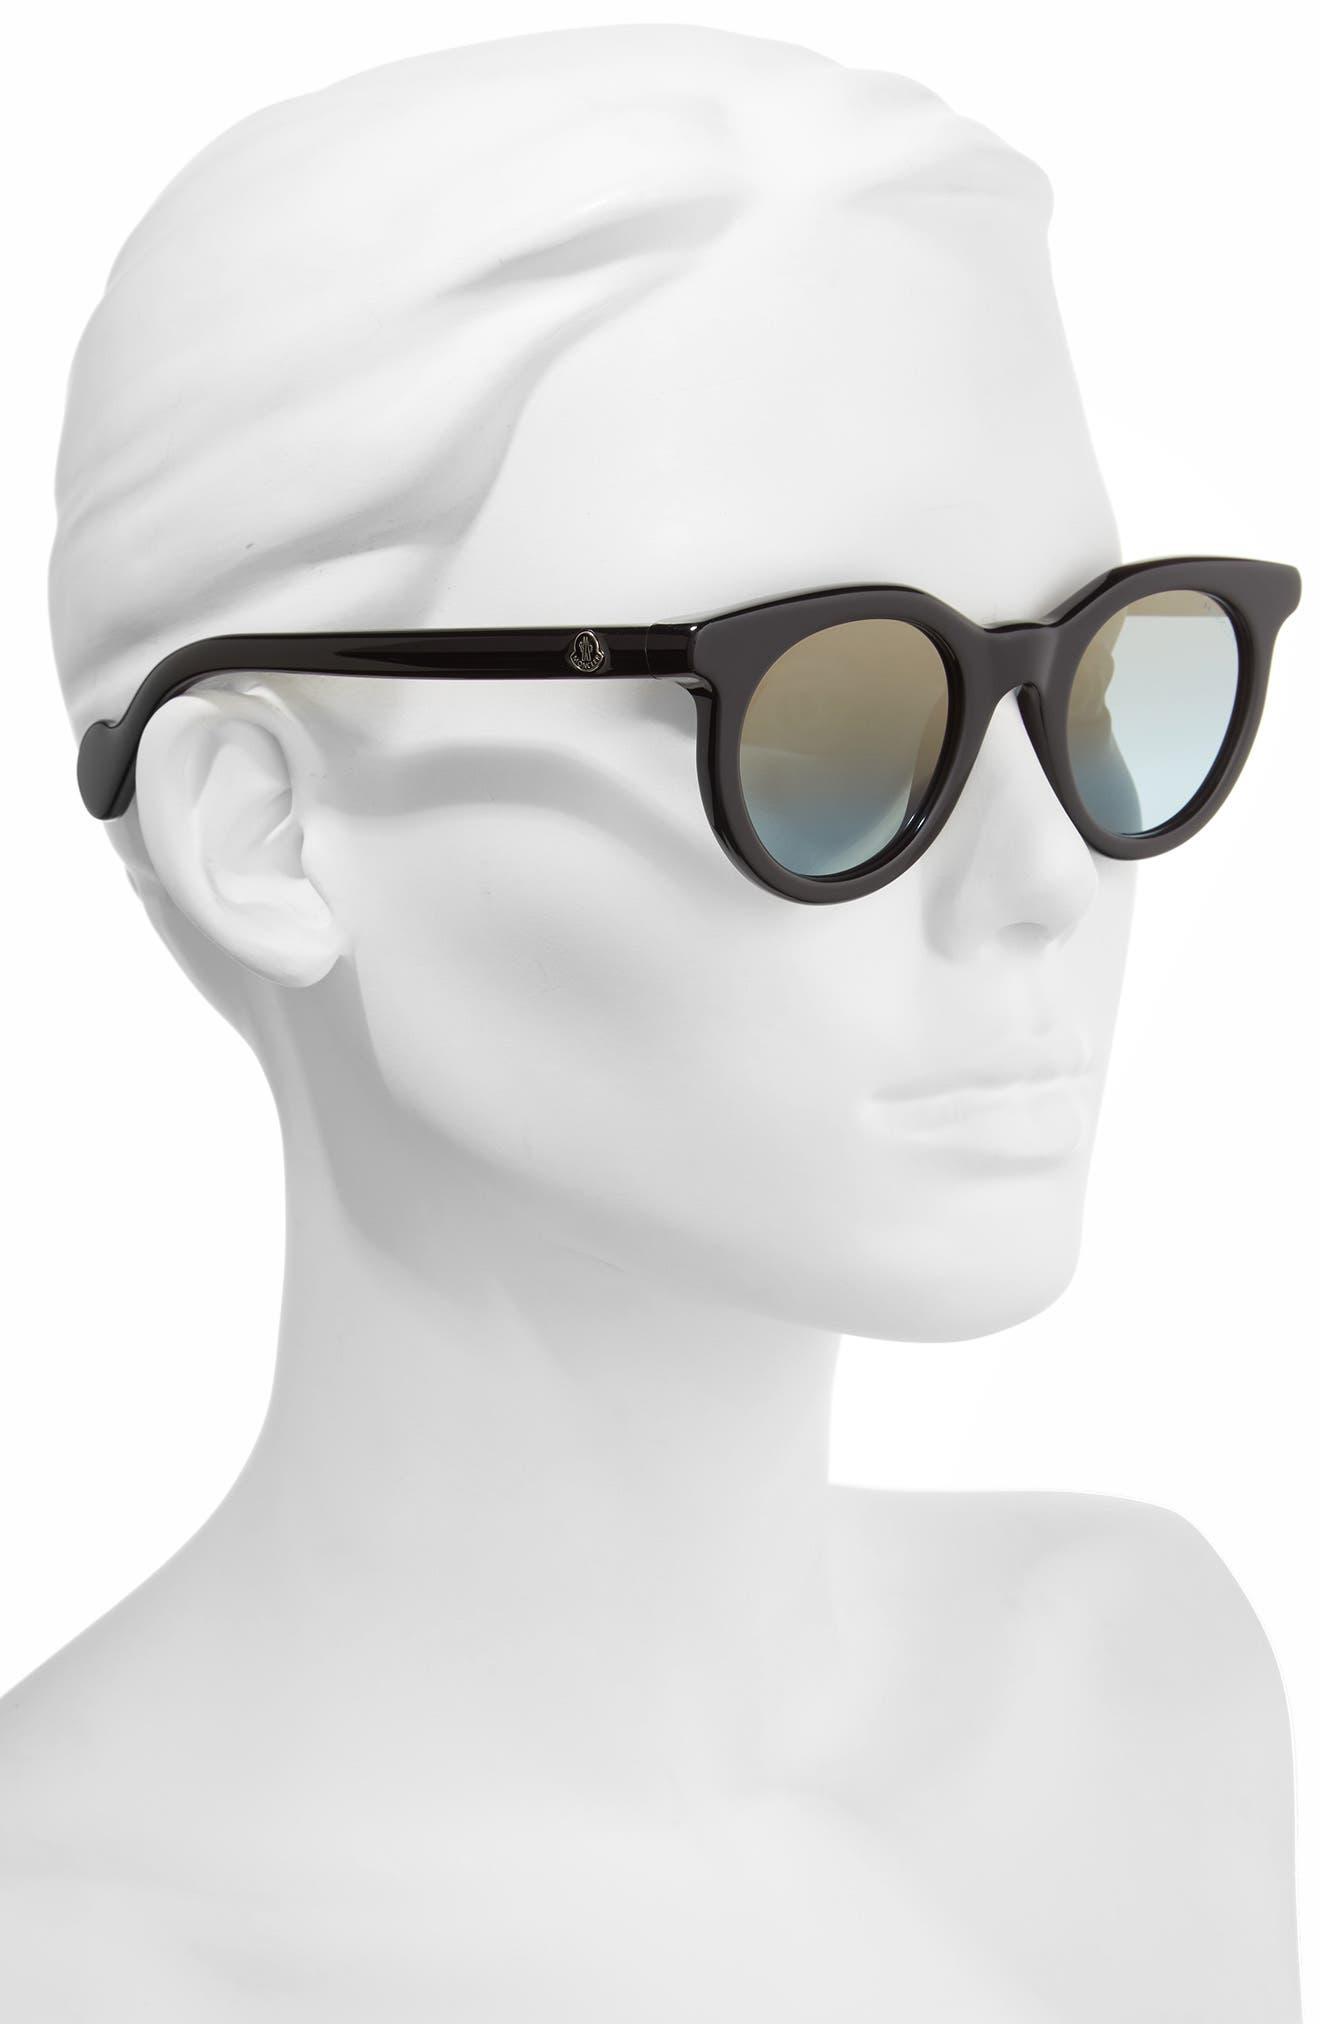 47mm Sunglasses,                             Alternate thumbnail 2, color,                             001